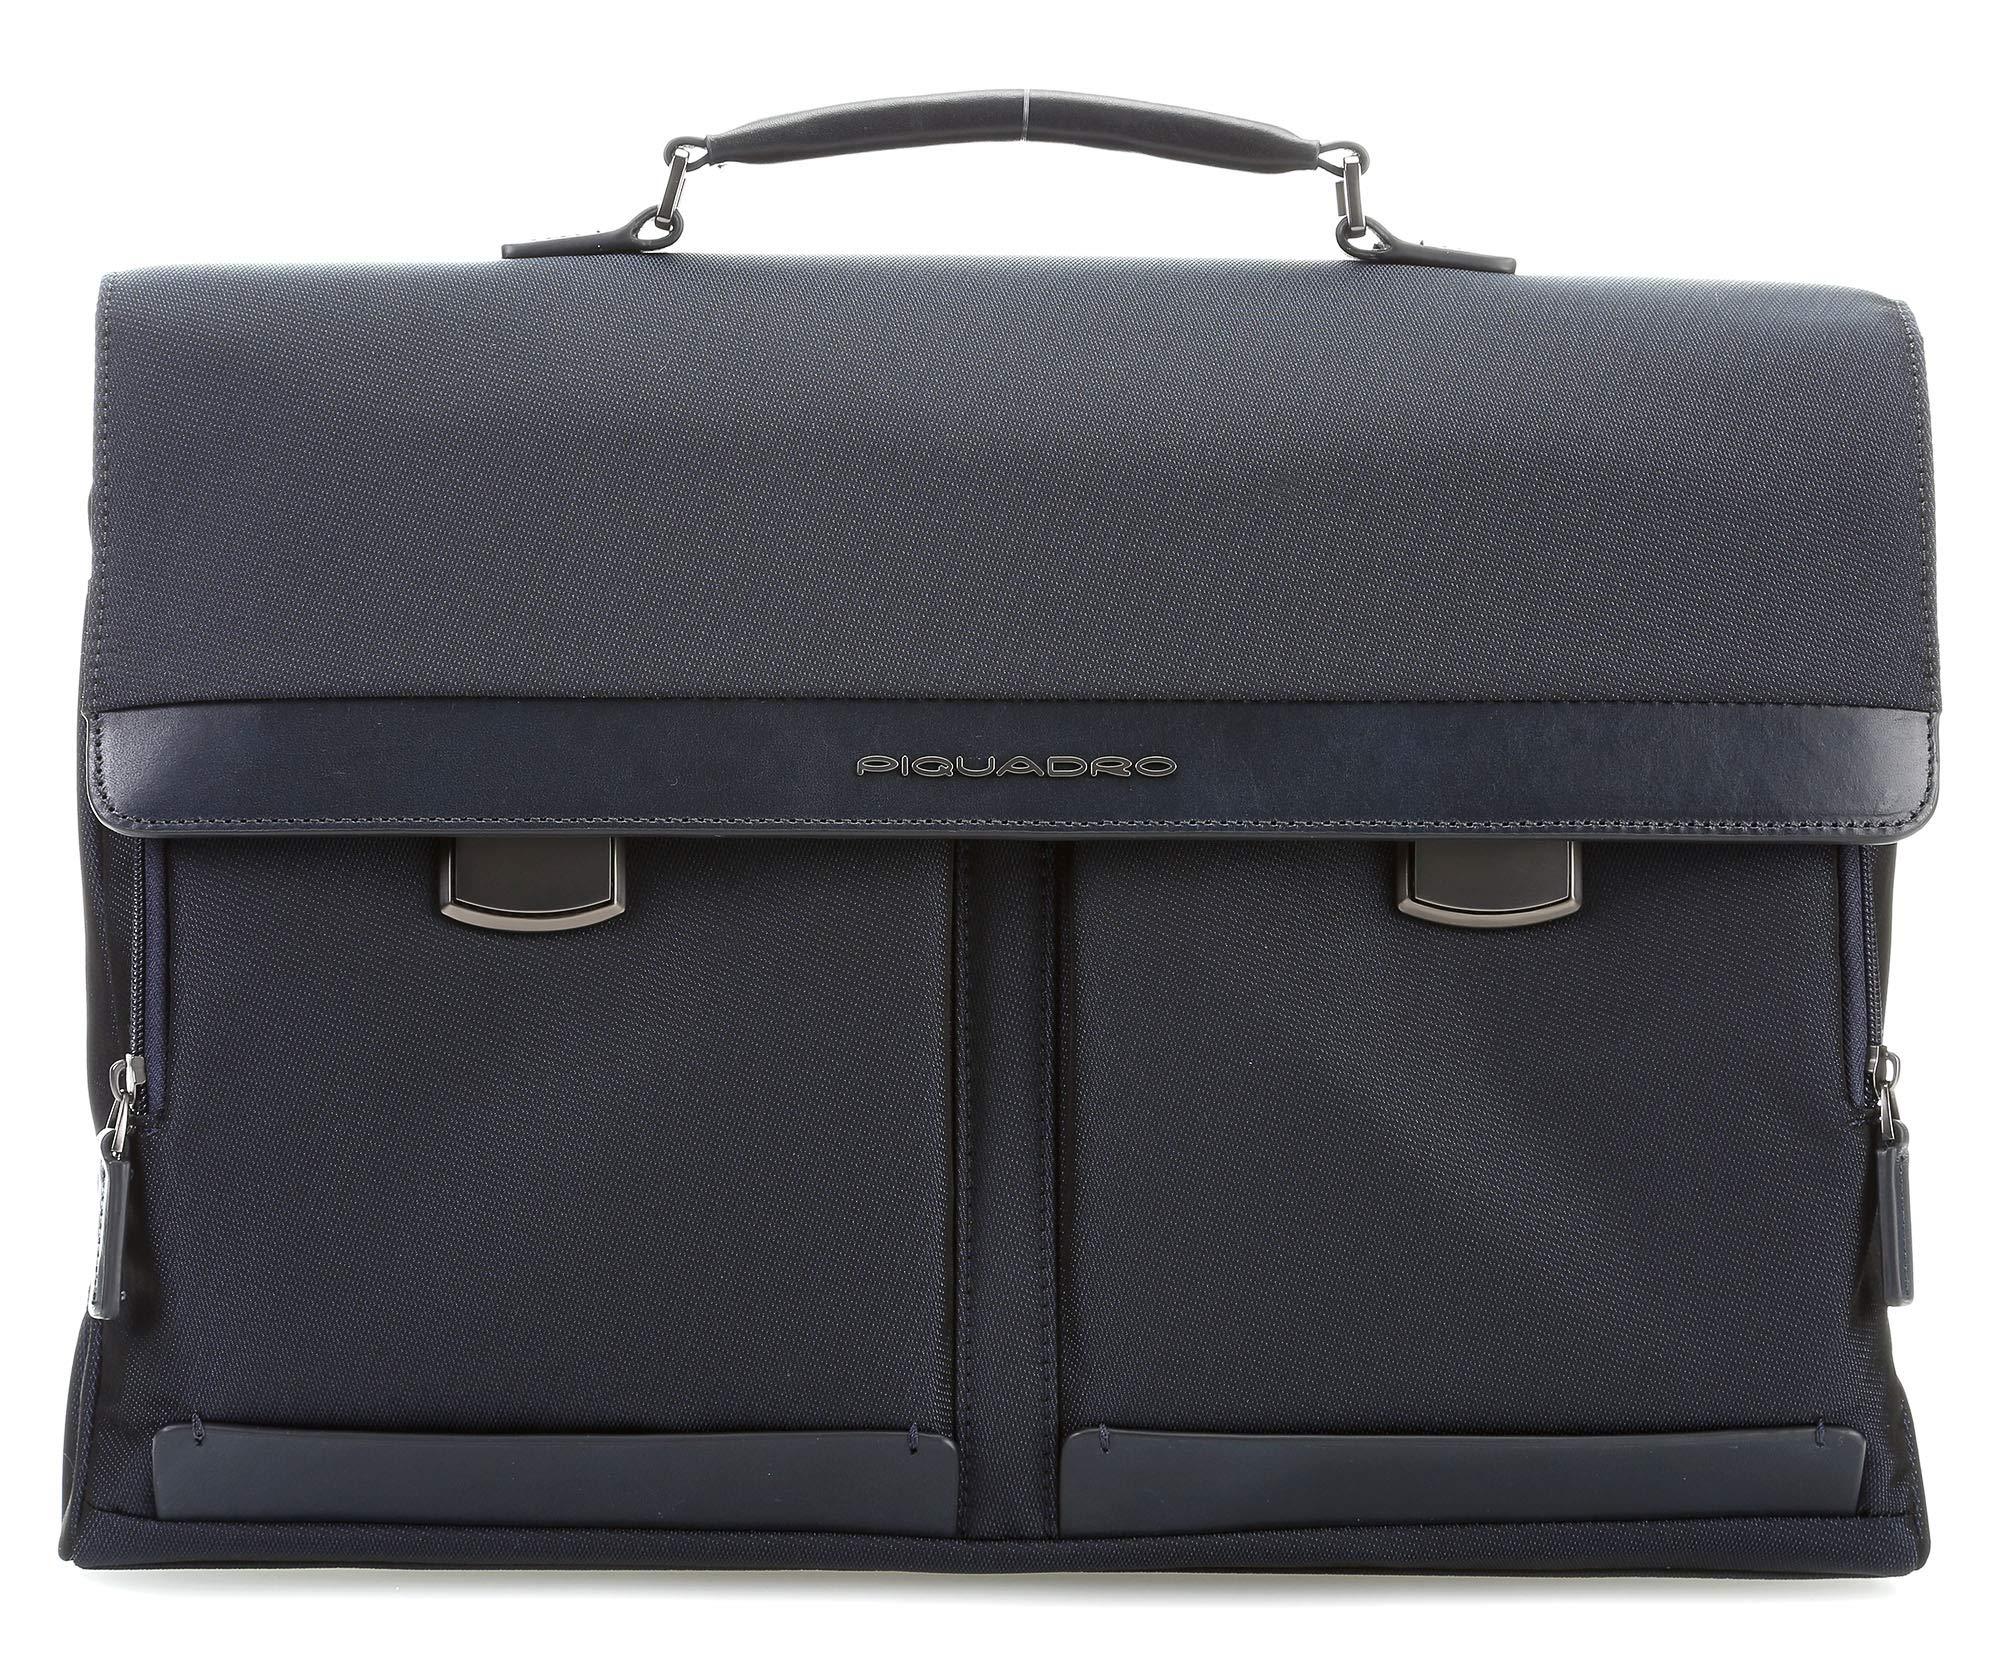 29x30x5cm Briefcase TLMYDD Mens Bag Business Briefcase Fashion Tote Leather Shoulder Crossbody Bag Brown